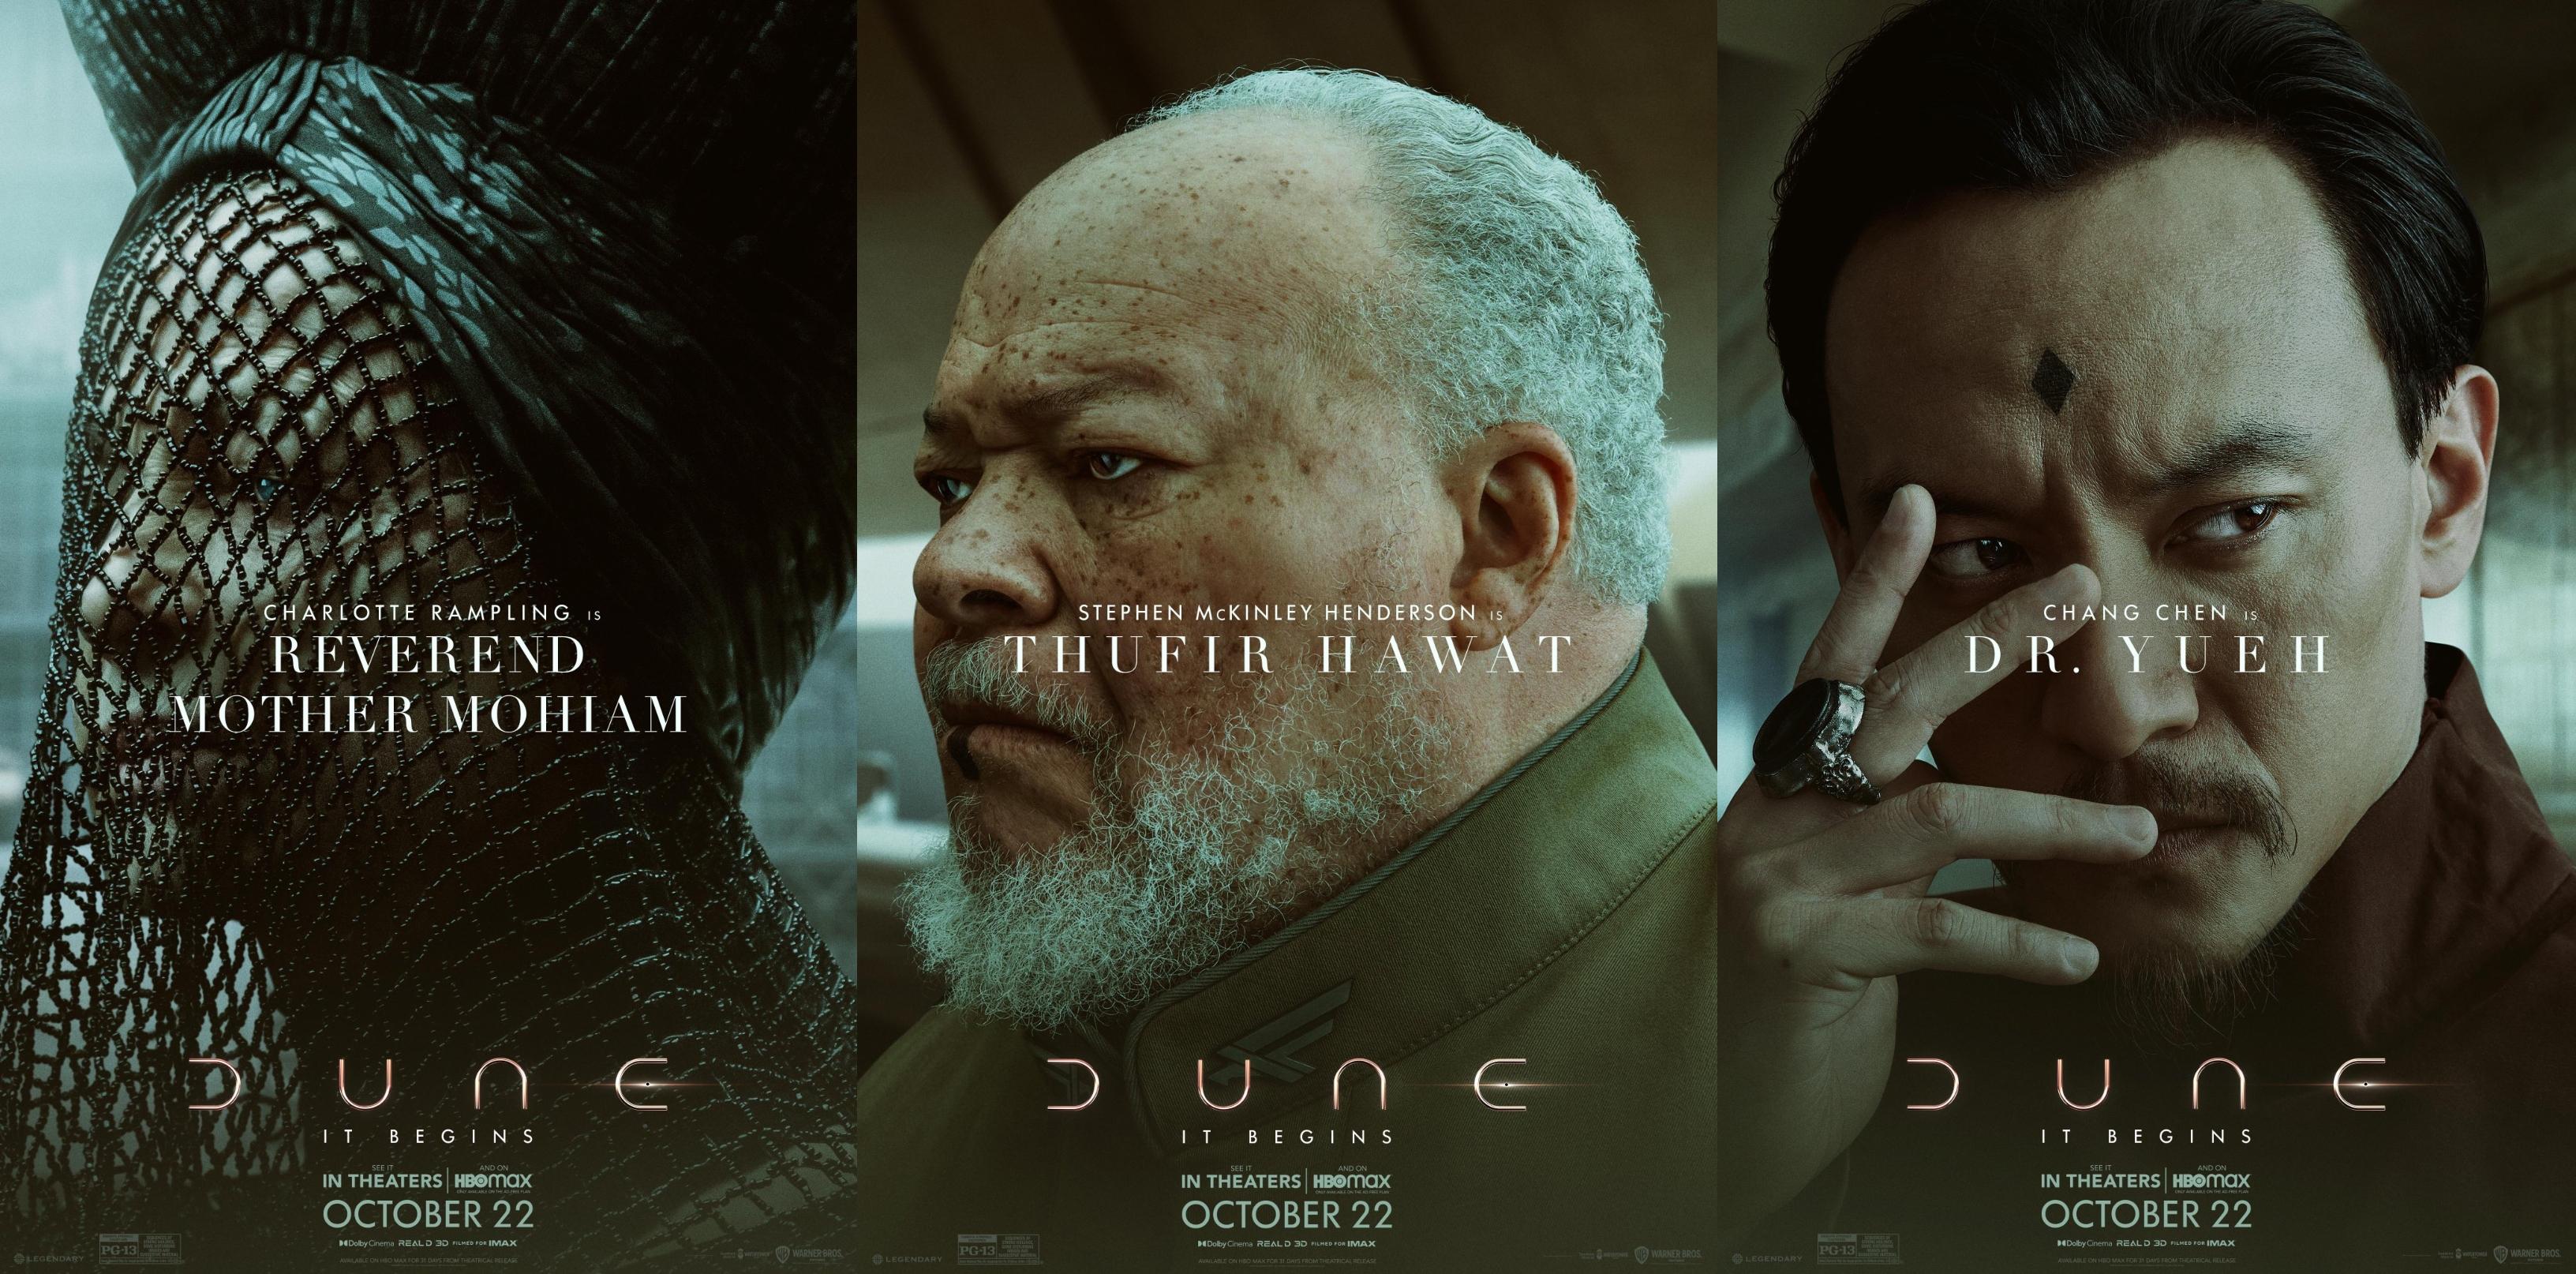 New Dune Trailer Released